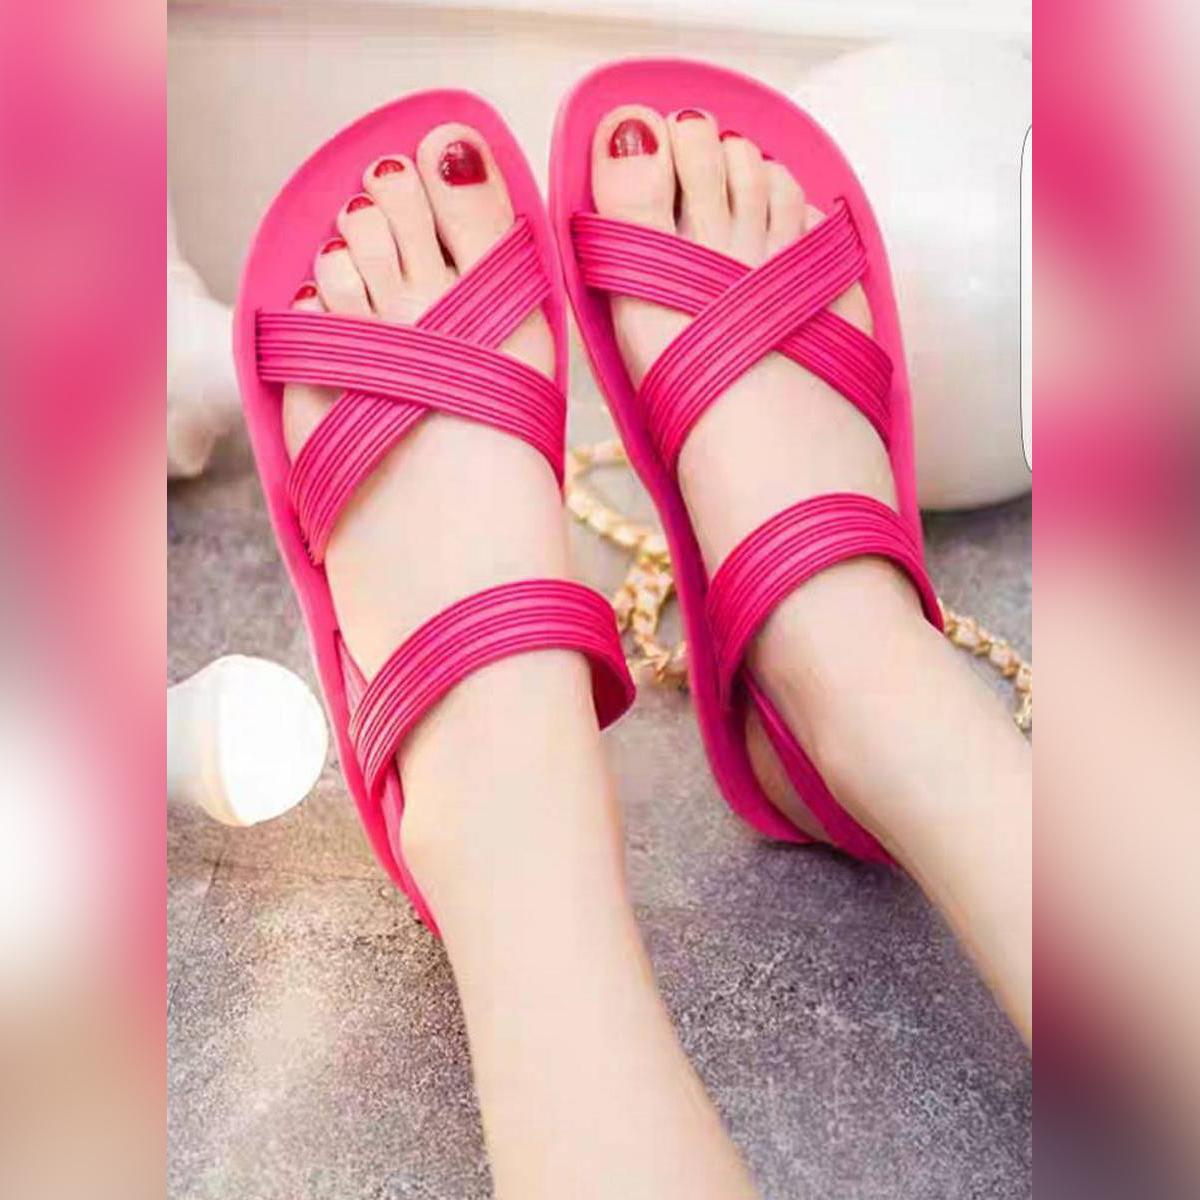 Ladies Rubber Beach Sandals.